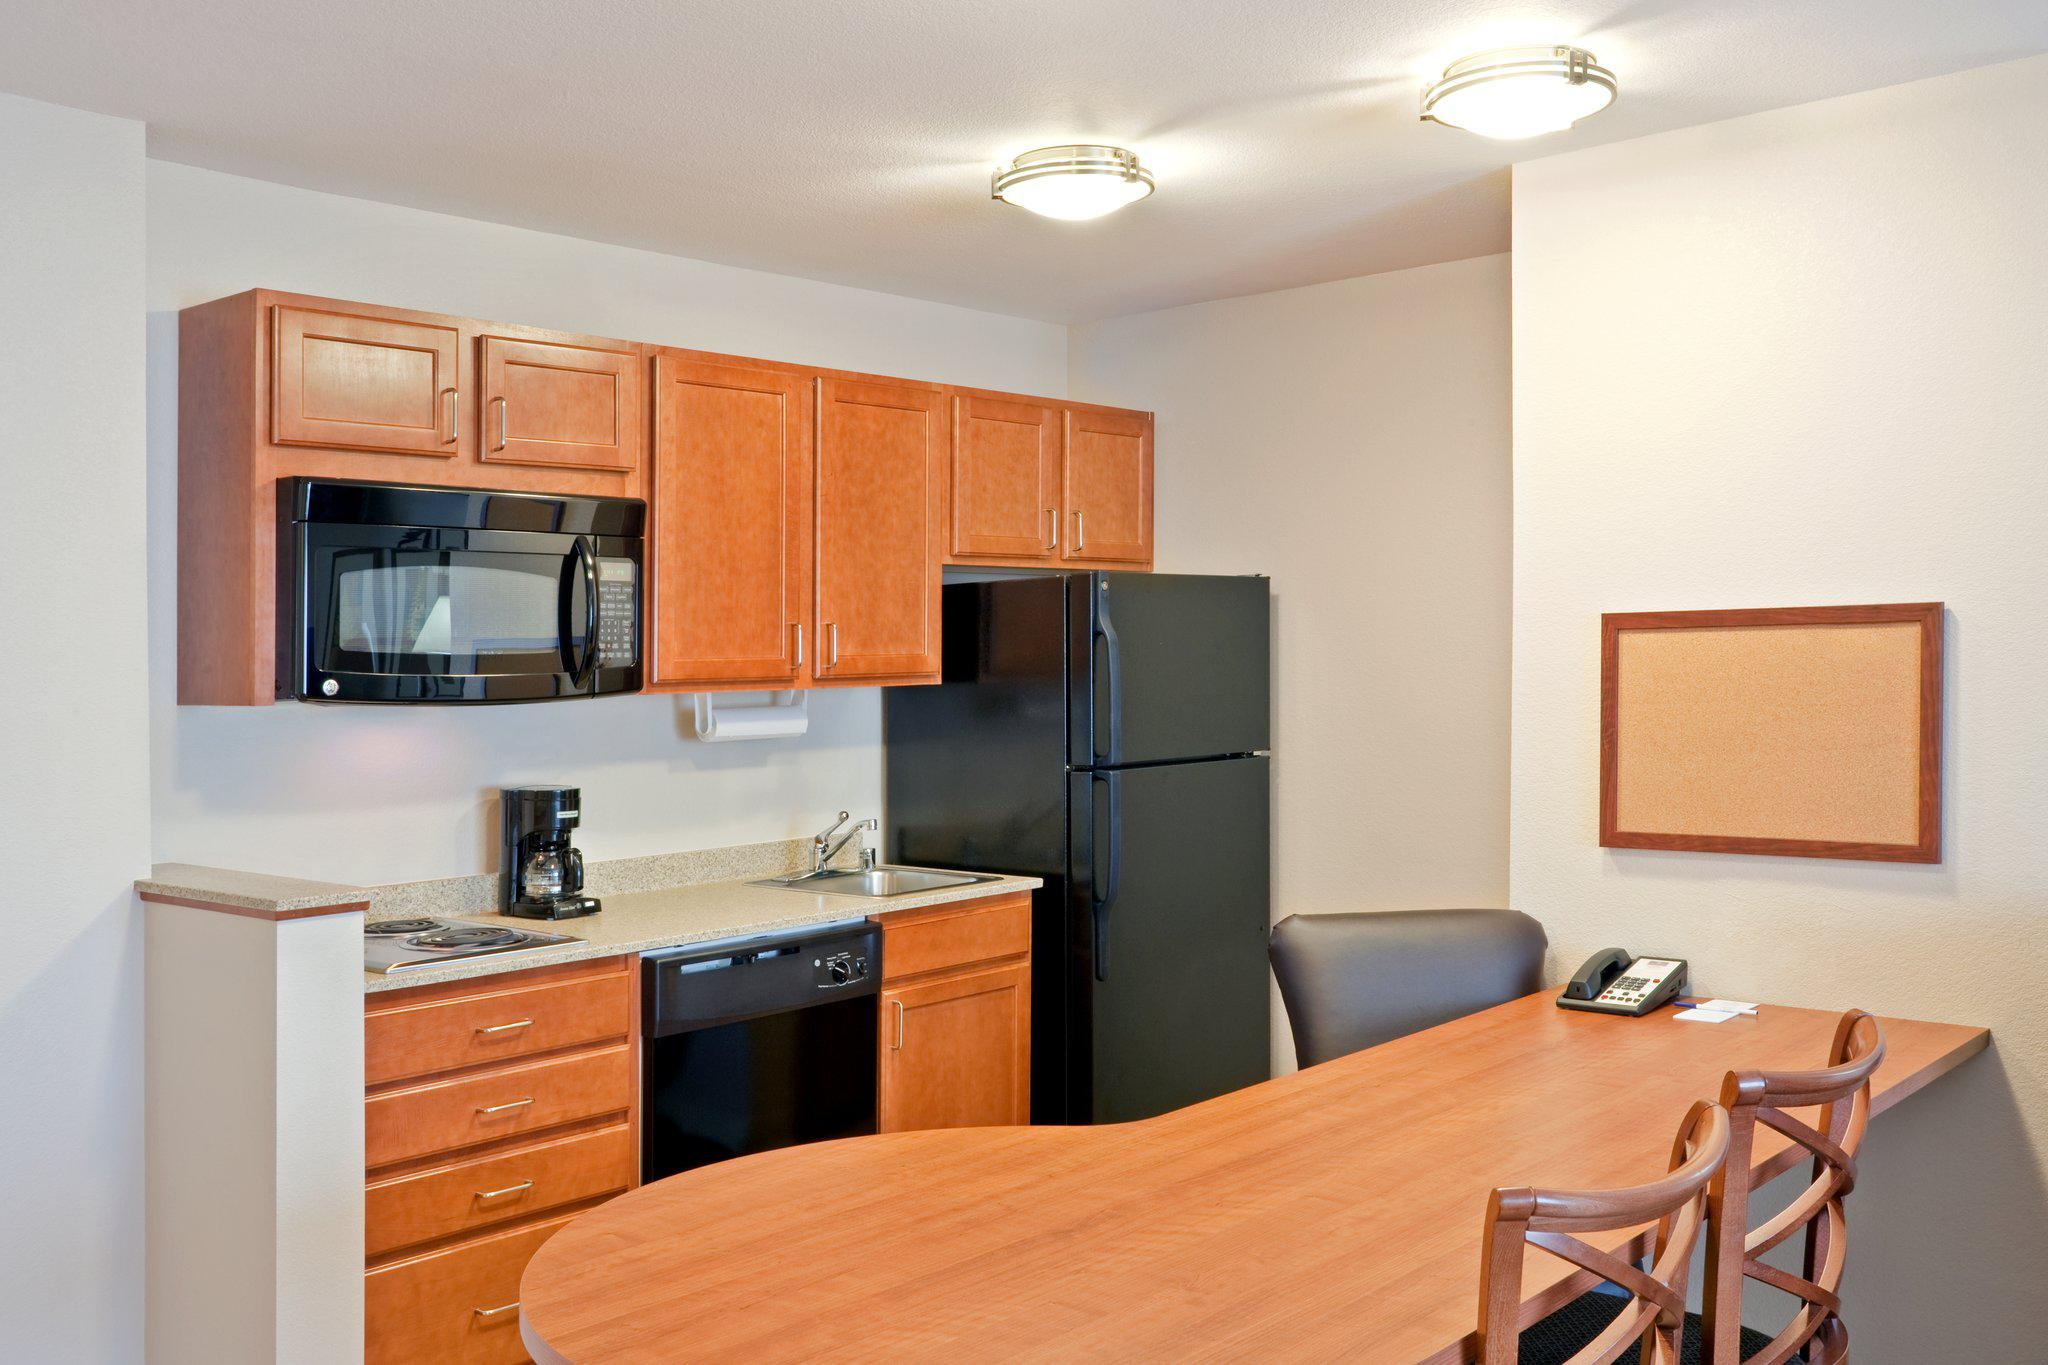 Candlewood Suites Oak Harbor in Oak Harbor, WA, photo #4